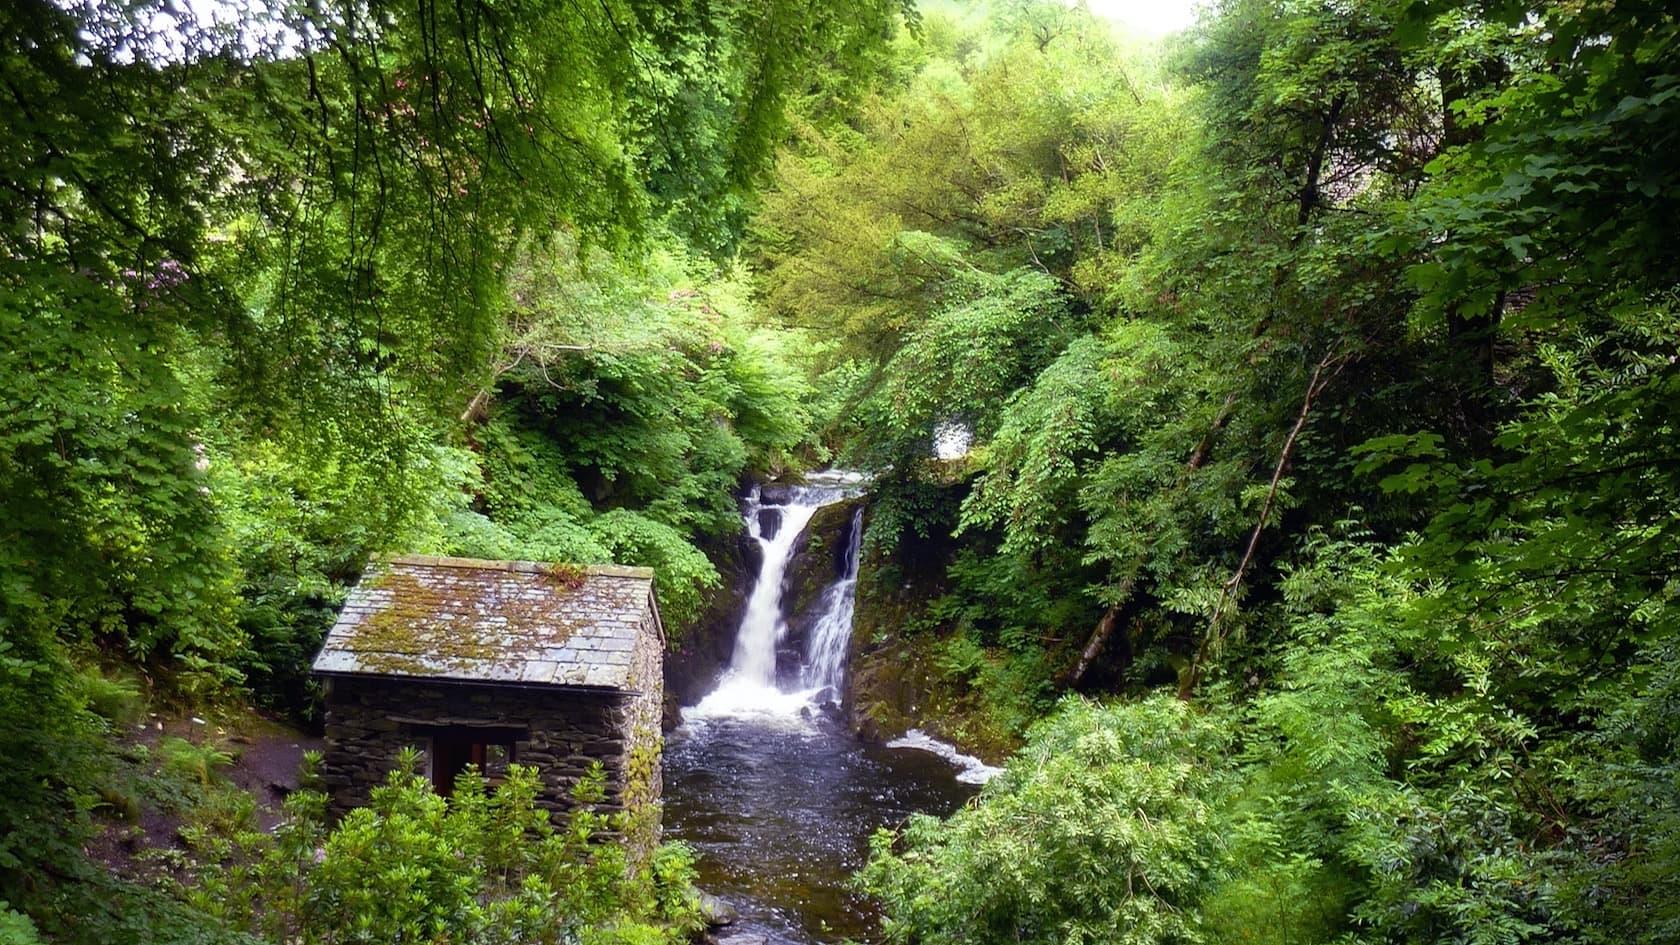 Visiting Rydal Falls